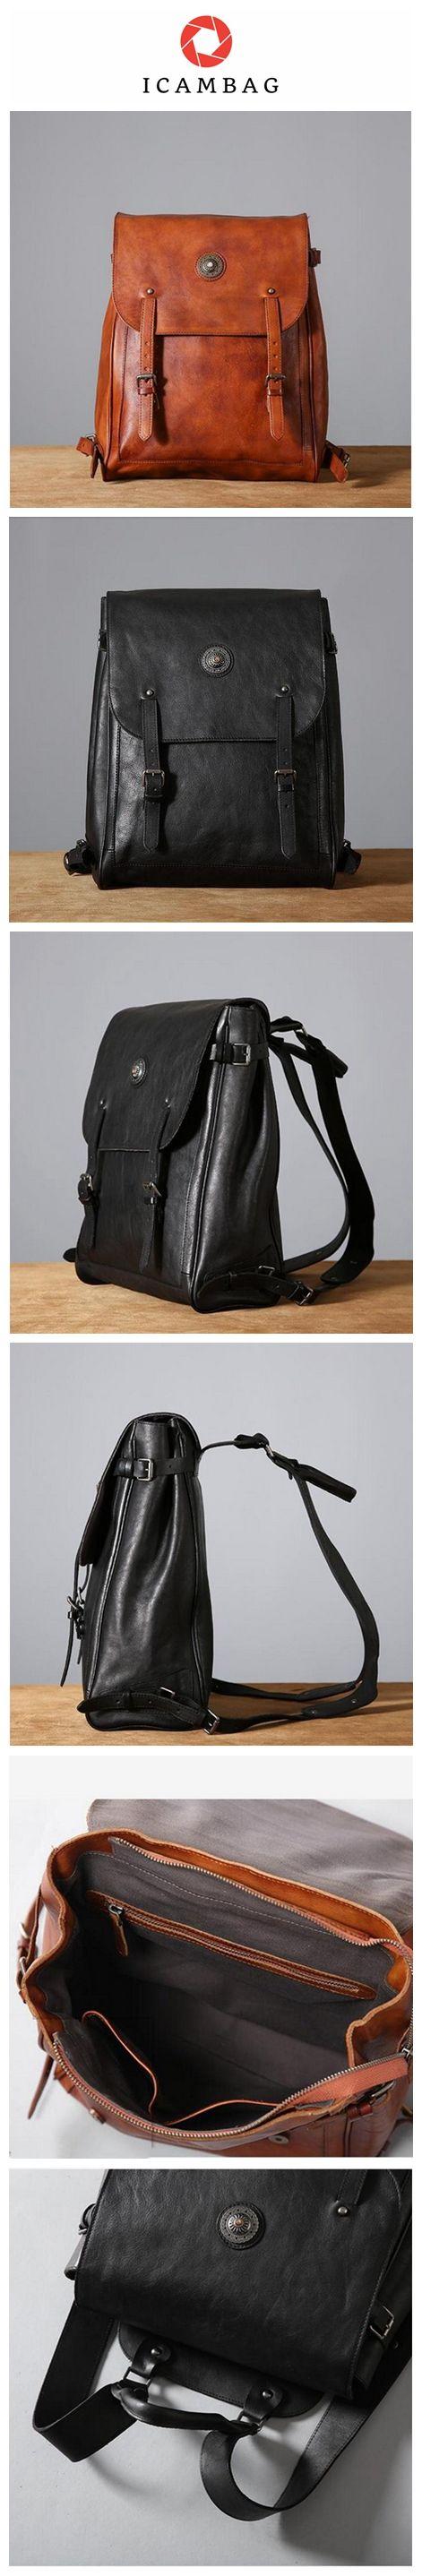 Vintage Handmade Cow Leather Backpack, School Backpack, Laptop Backpack